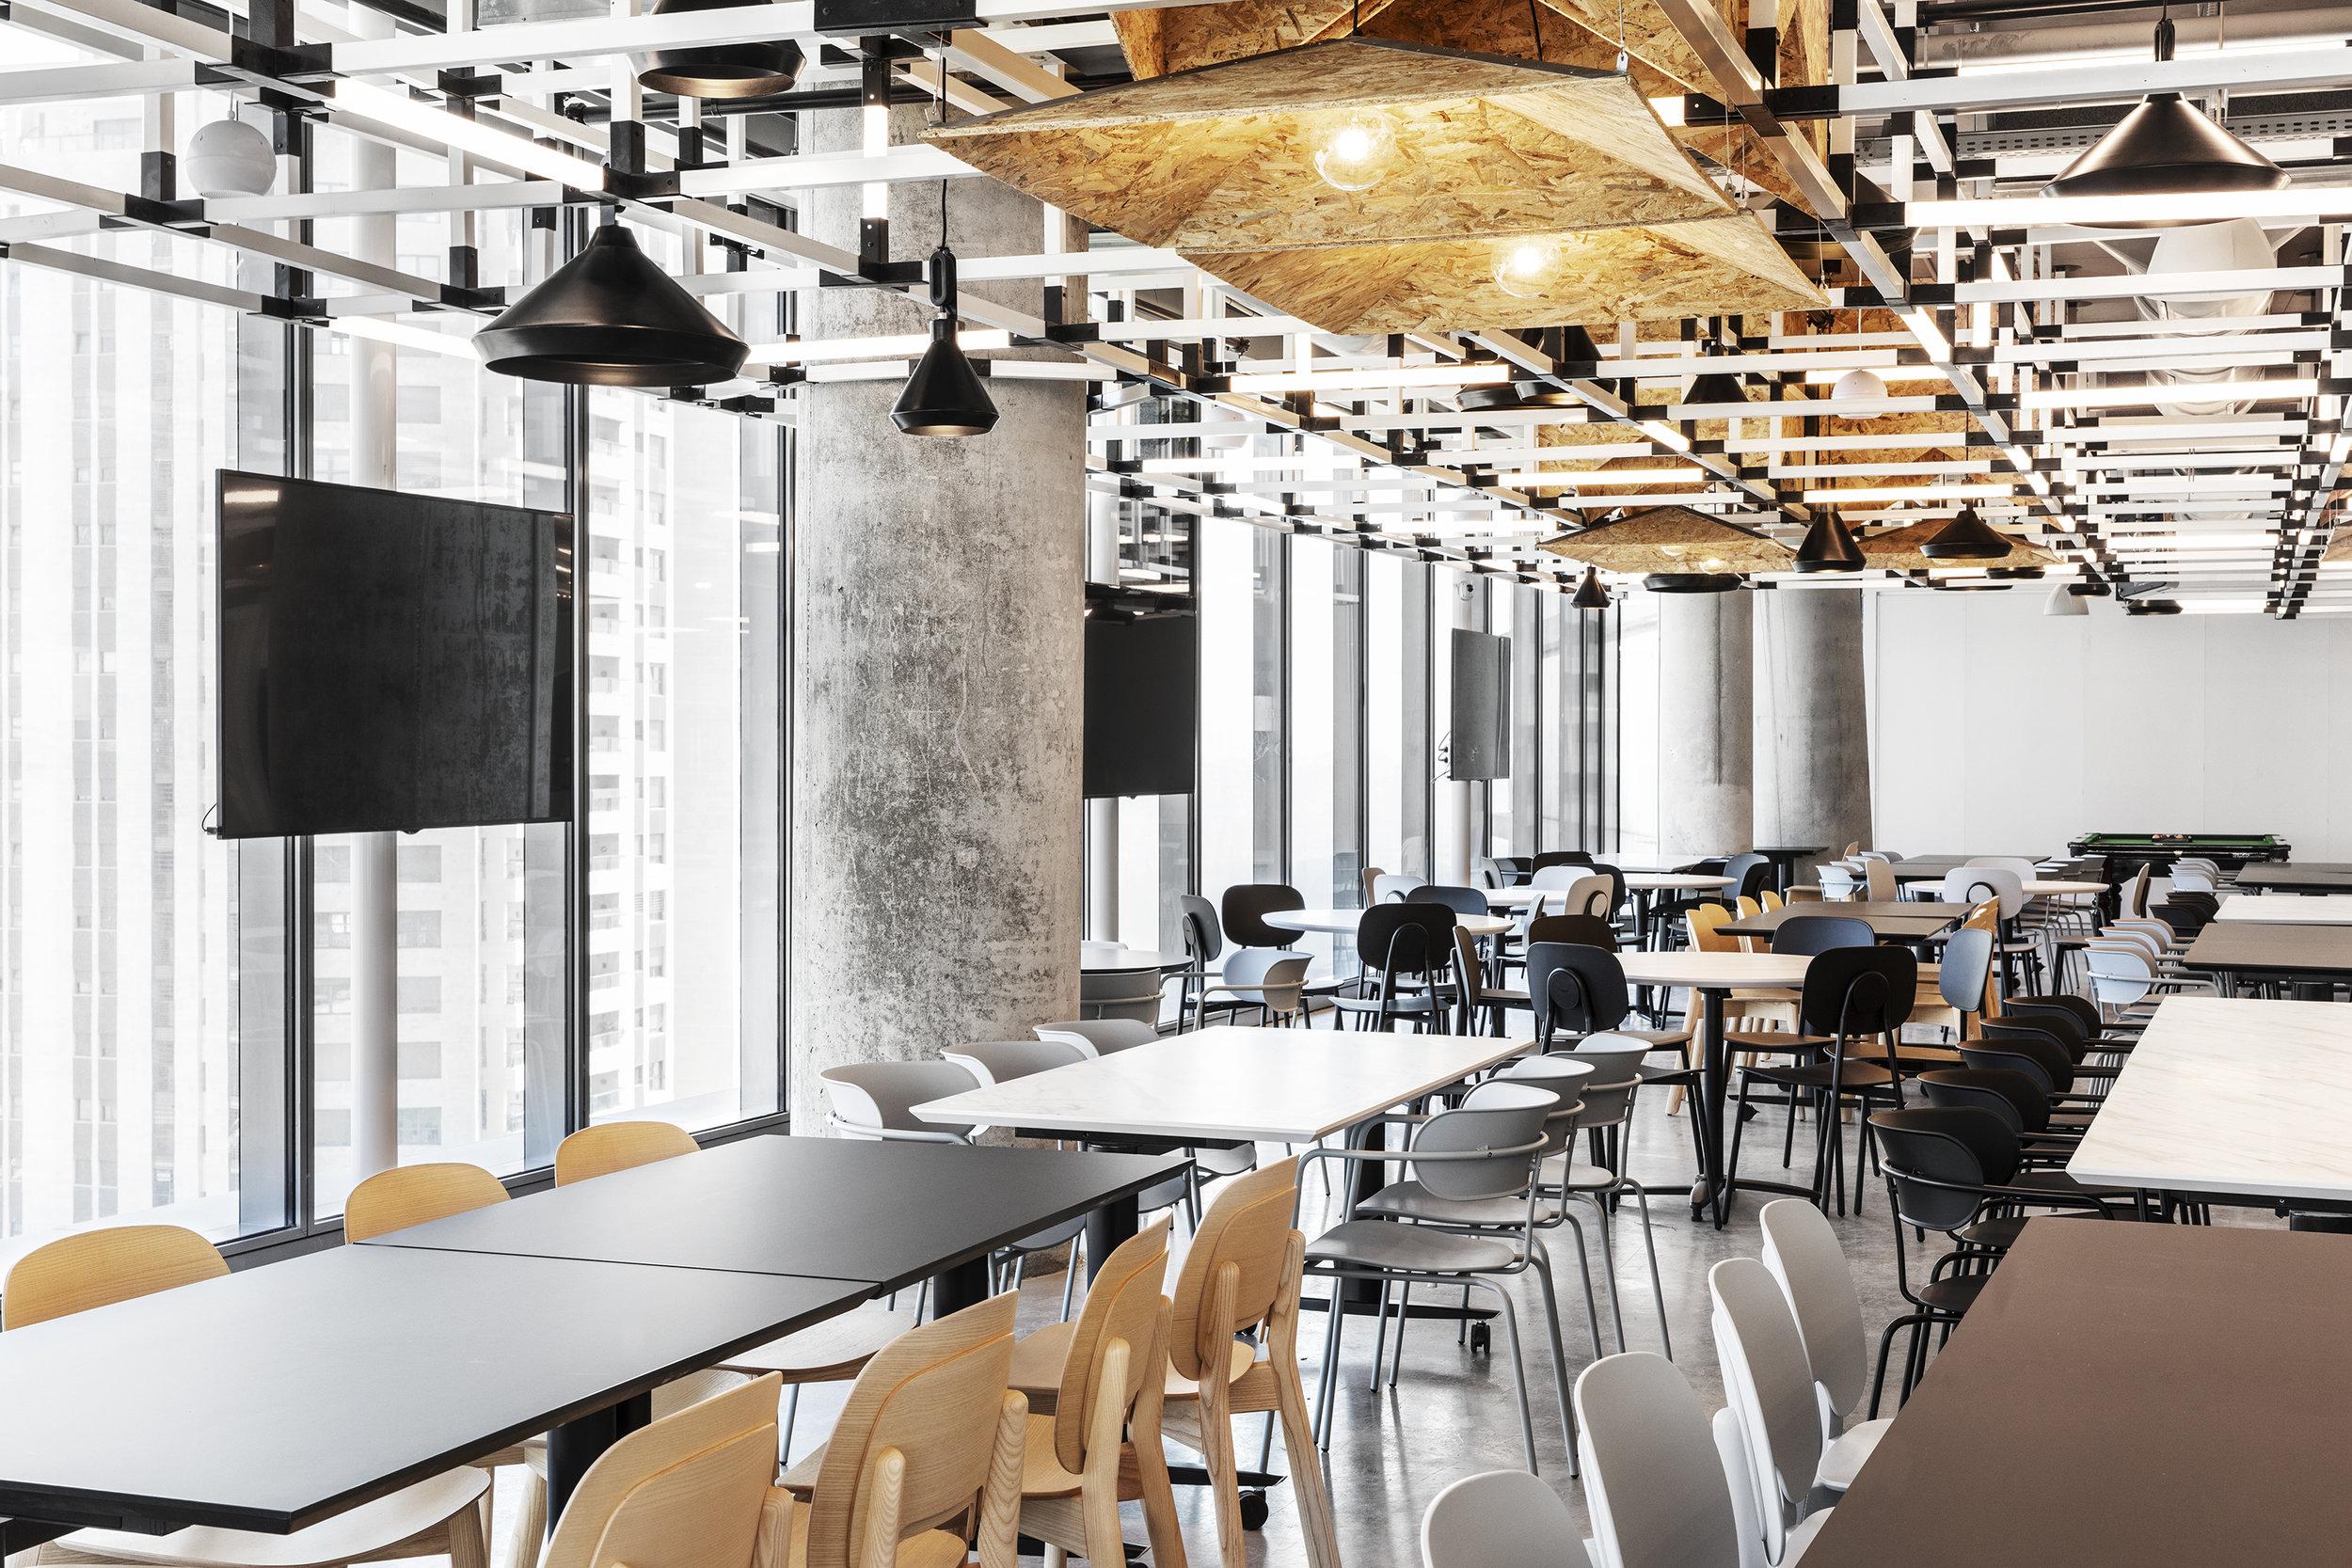 רואי דוד אדריכלות - אדריכל - נטורל אינטליג'נס - ROY DAVID - ARCHITECTURE - ARCHITECT - NI (7).jpg